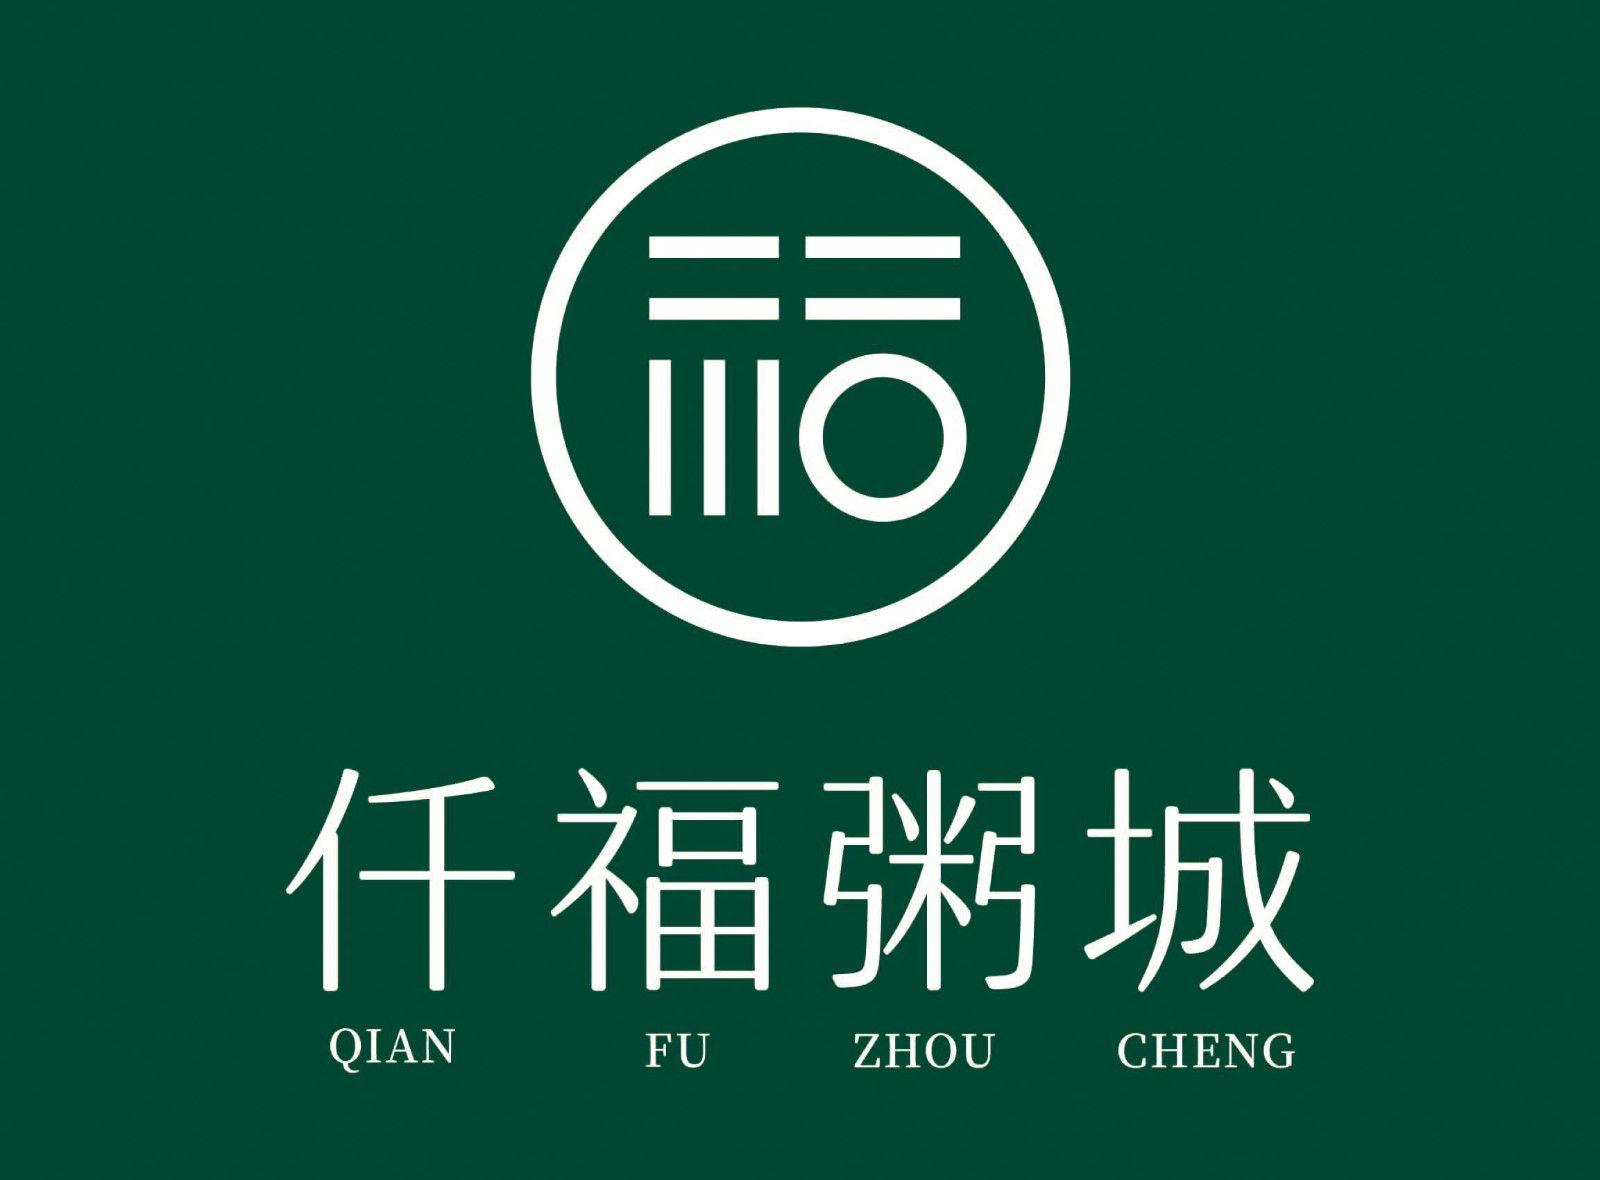 logo 标识 标志 设计 图标 1600_1180